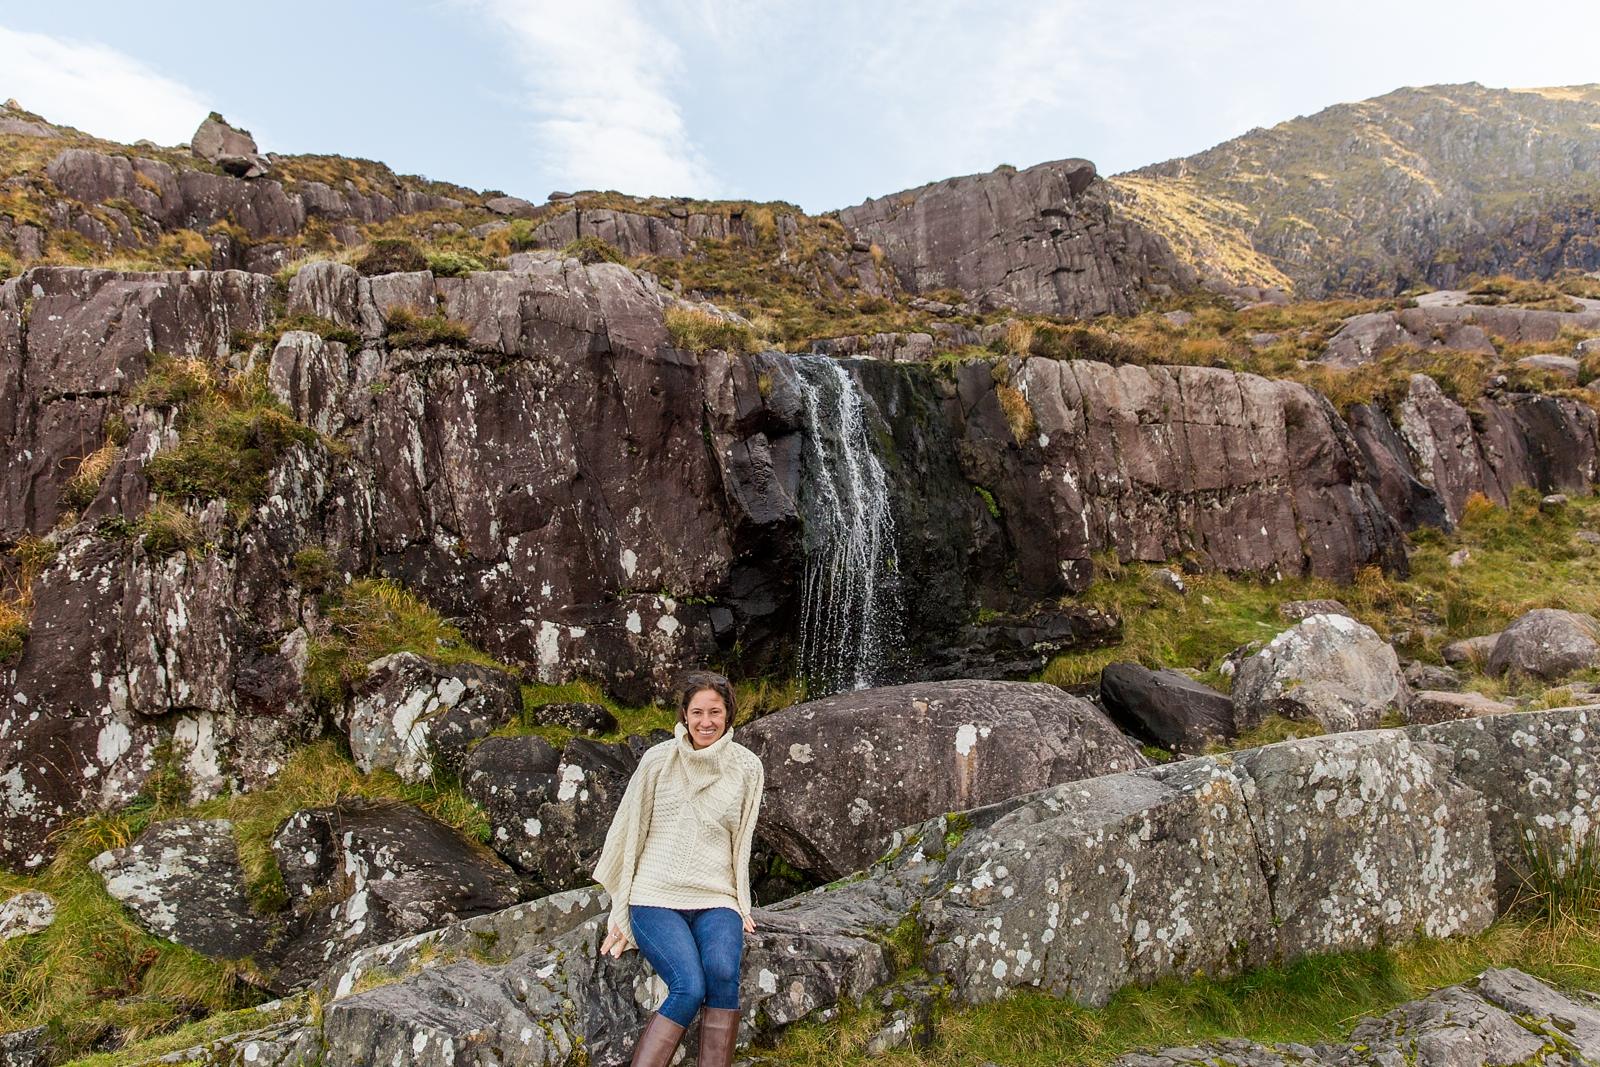 allegra_anderson_photography_travel_photographer_ireland188